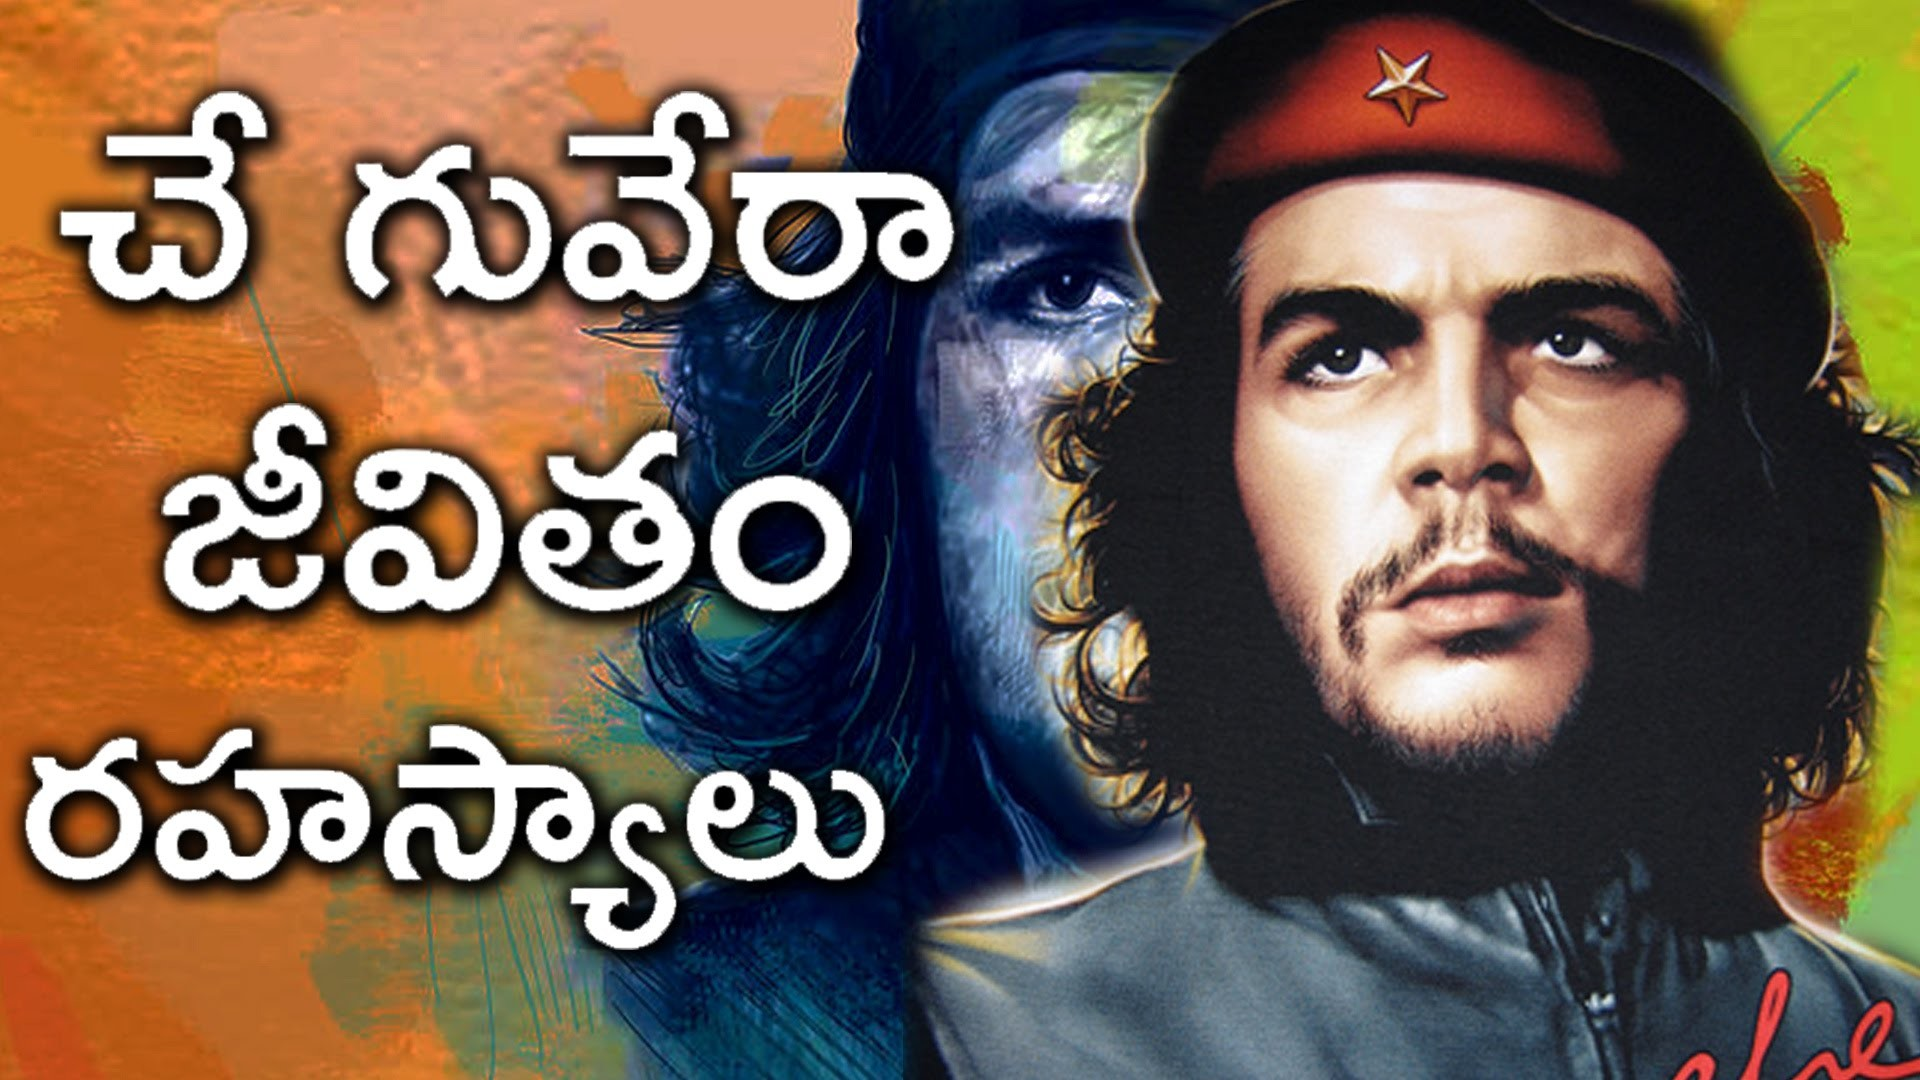 Che Guevara Life History Full Video in Telugu | చే గువేరా జీవితం..రహస్యాలు  పూర్తి వివరాలతో – YouTube